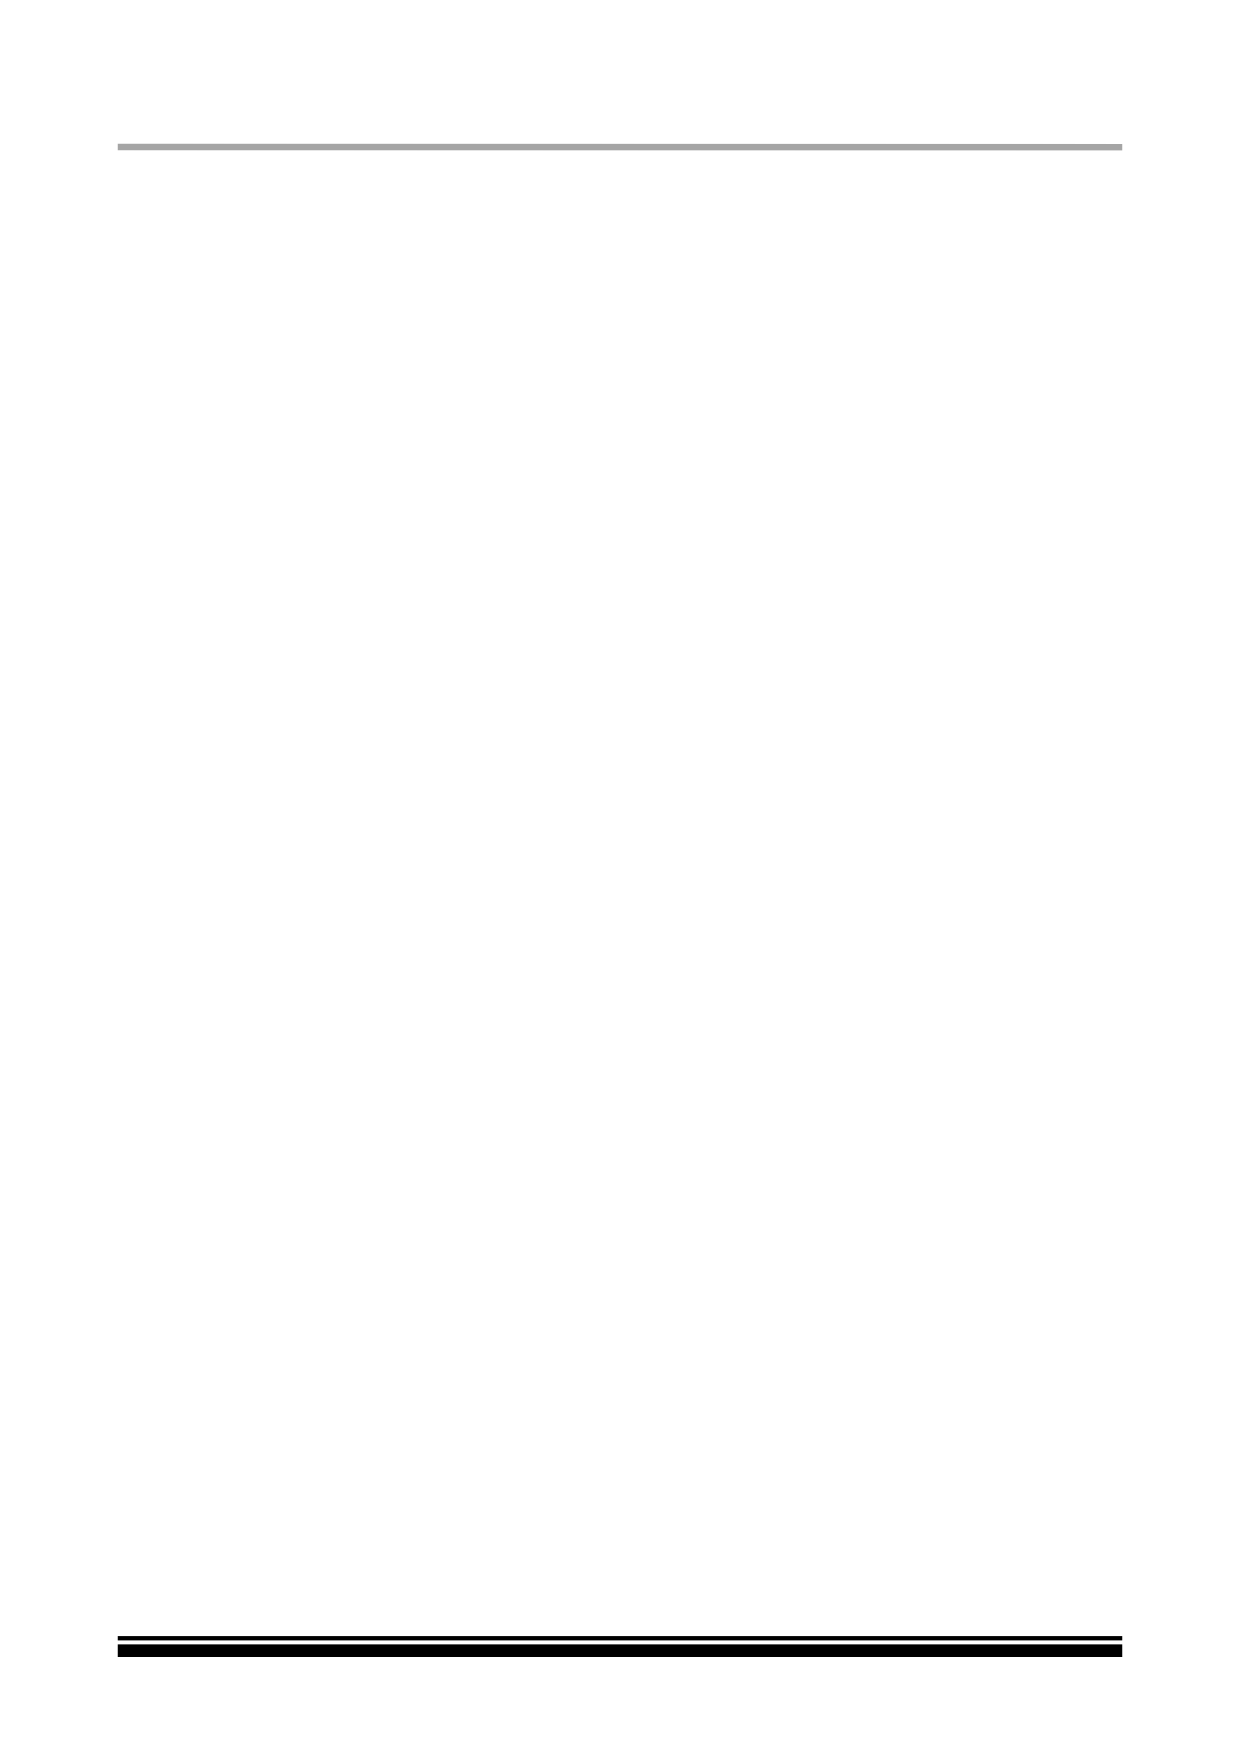 I3505-6HMT3224A Даташит, Описание, Даташиты